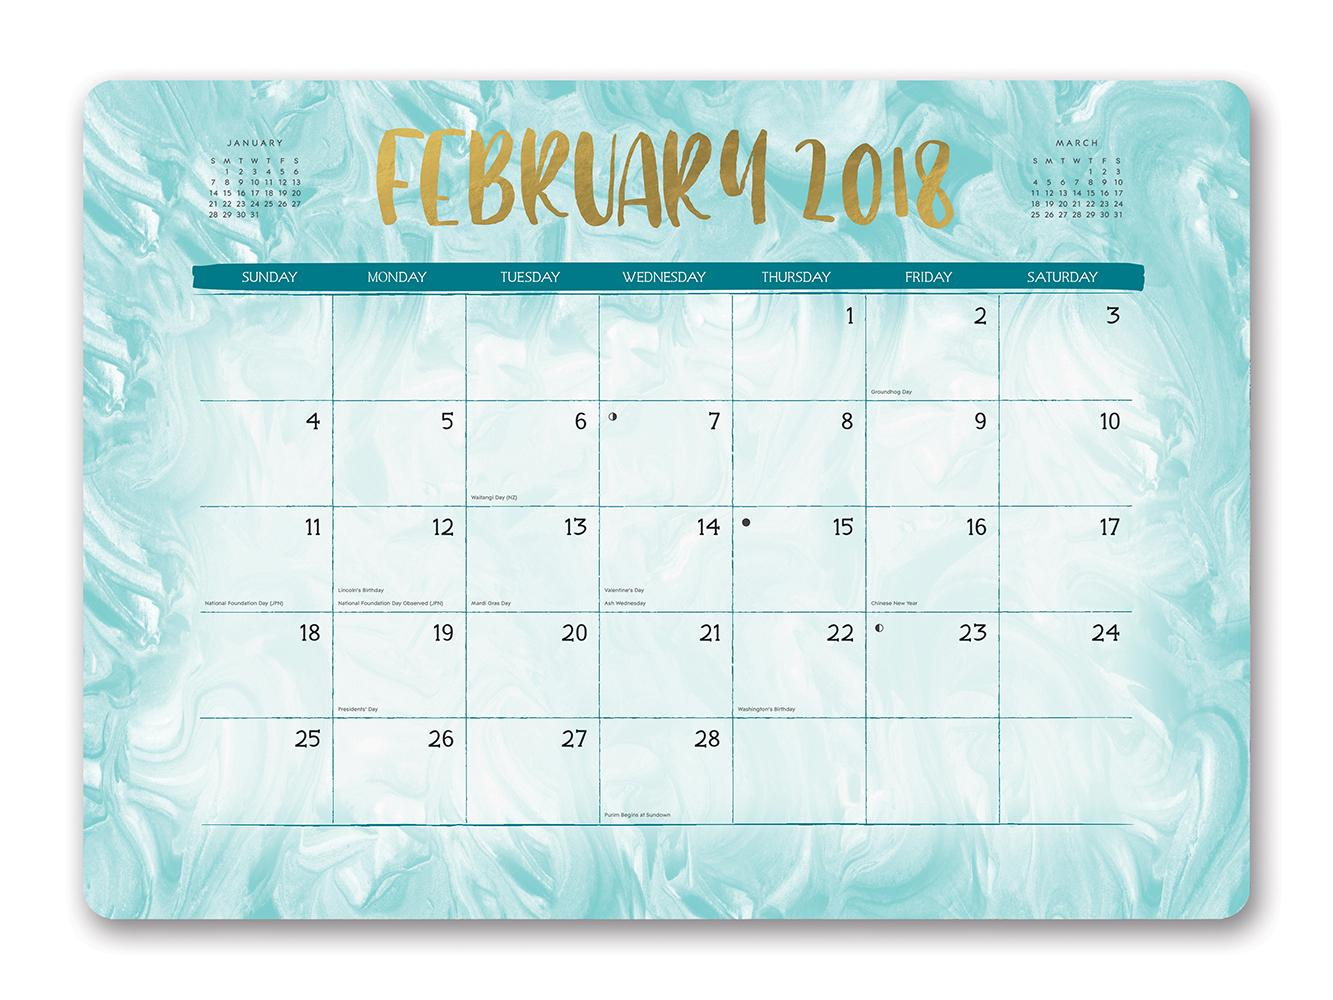 Gold Foil Marbling Decorative Desk Calendars 2018 by Orange Circle Studio inside 9781682582350